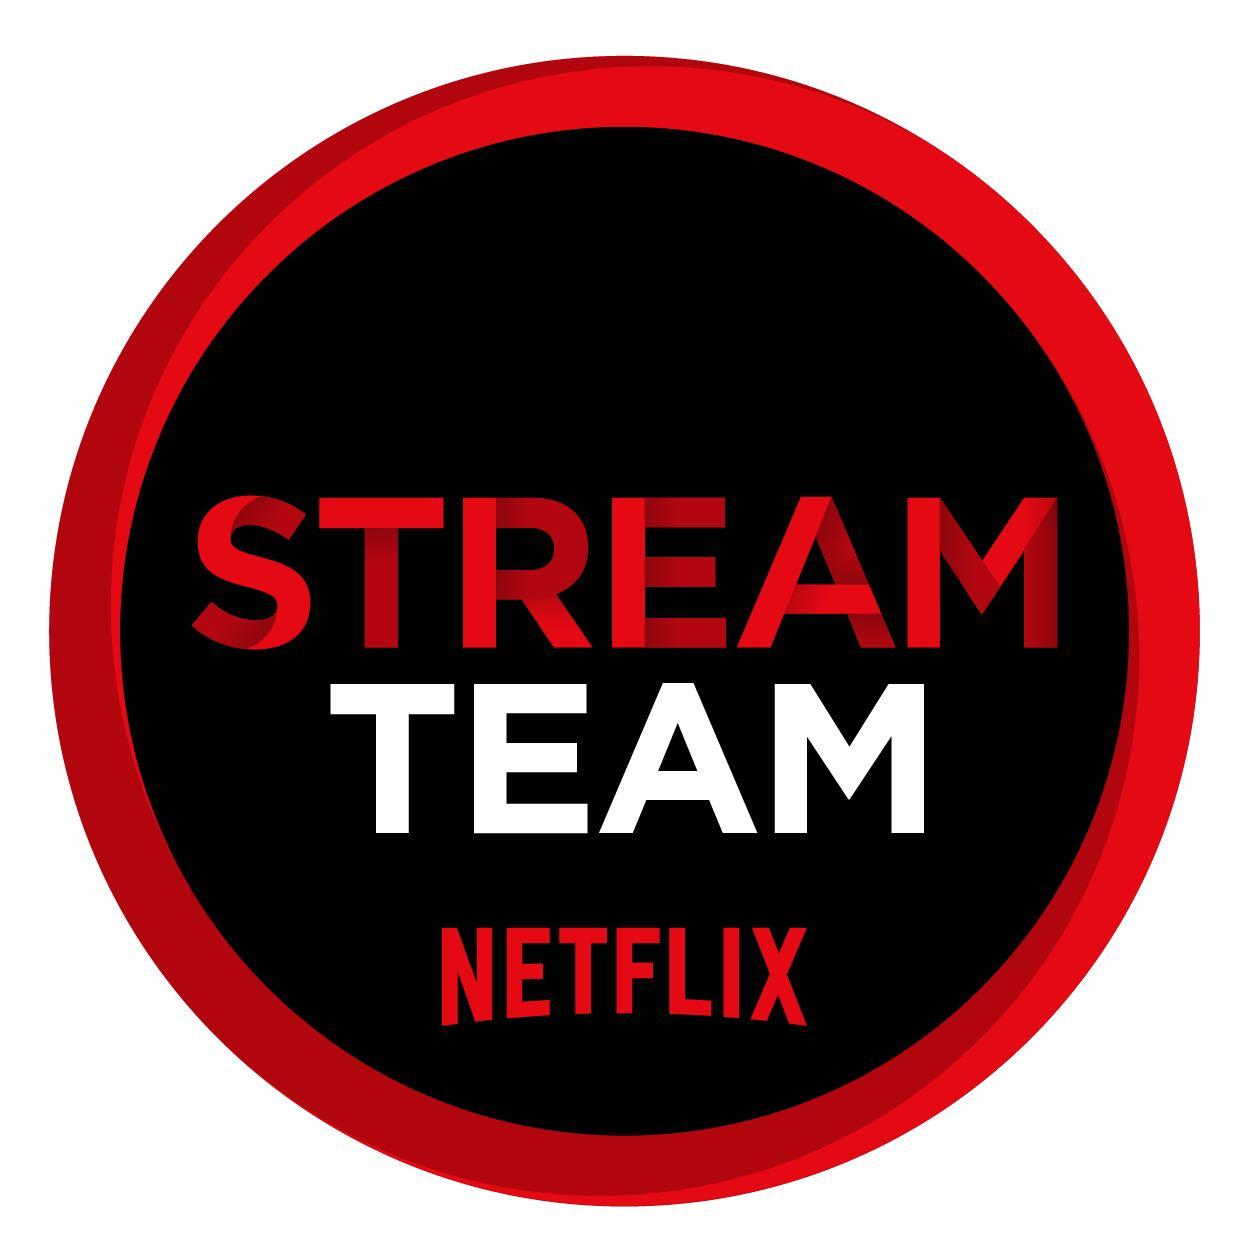 Netflix stream team Flavia Miranda Mães Brasileiras